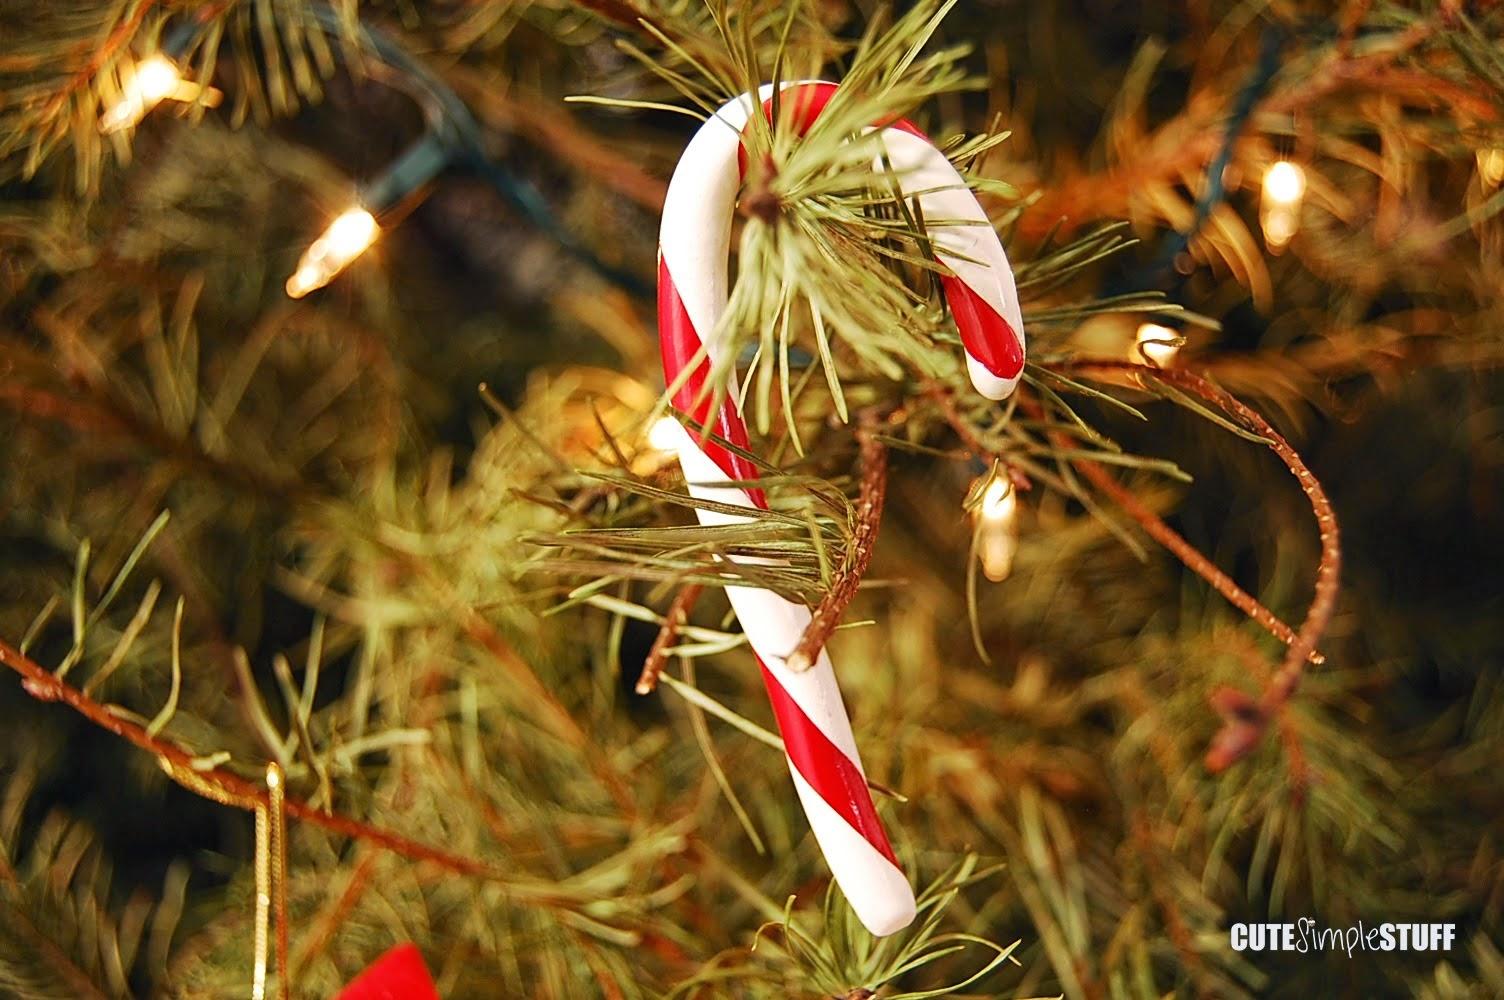 http://www.cutesimplestuff.com/2014/12/christmas-ornaments.html